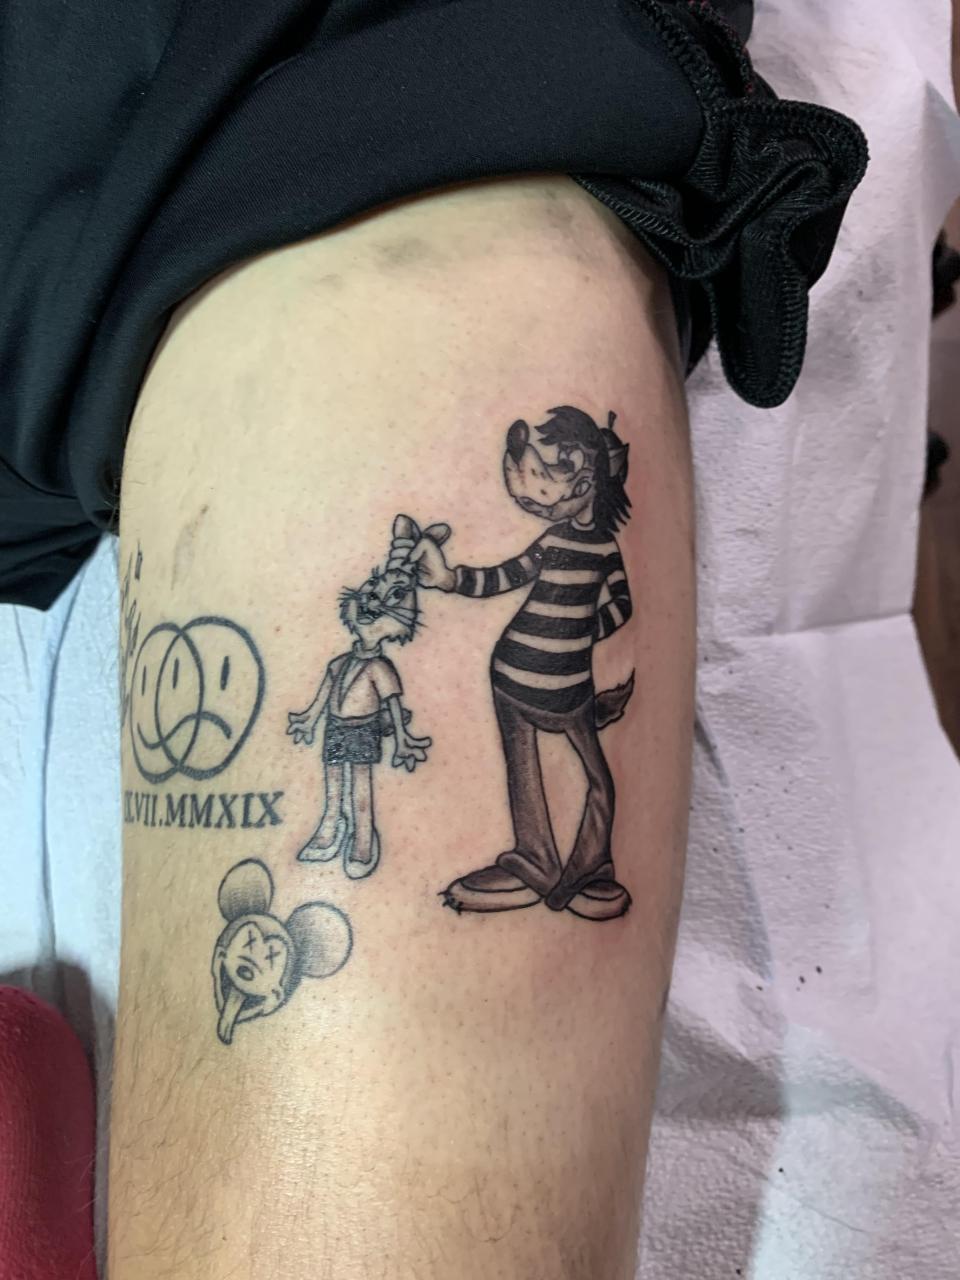 Nu Pogodi Tattoo done by Alina at Fresh Ink Kanata! Love this piece so much!